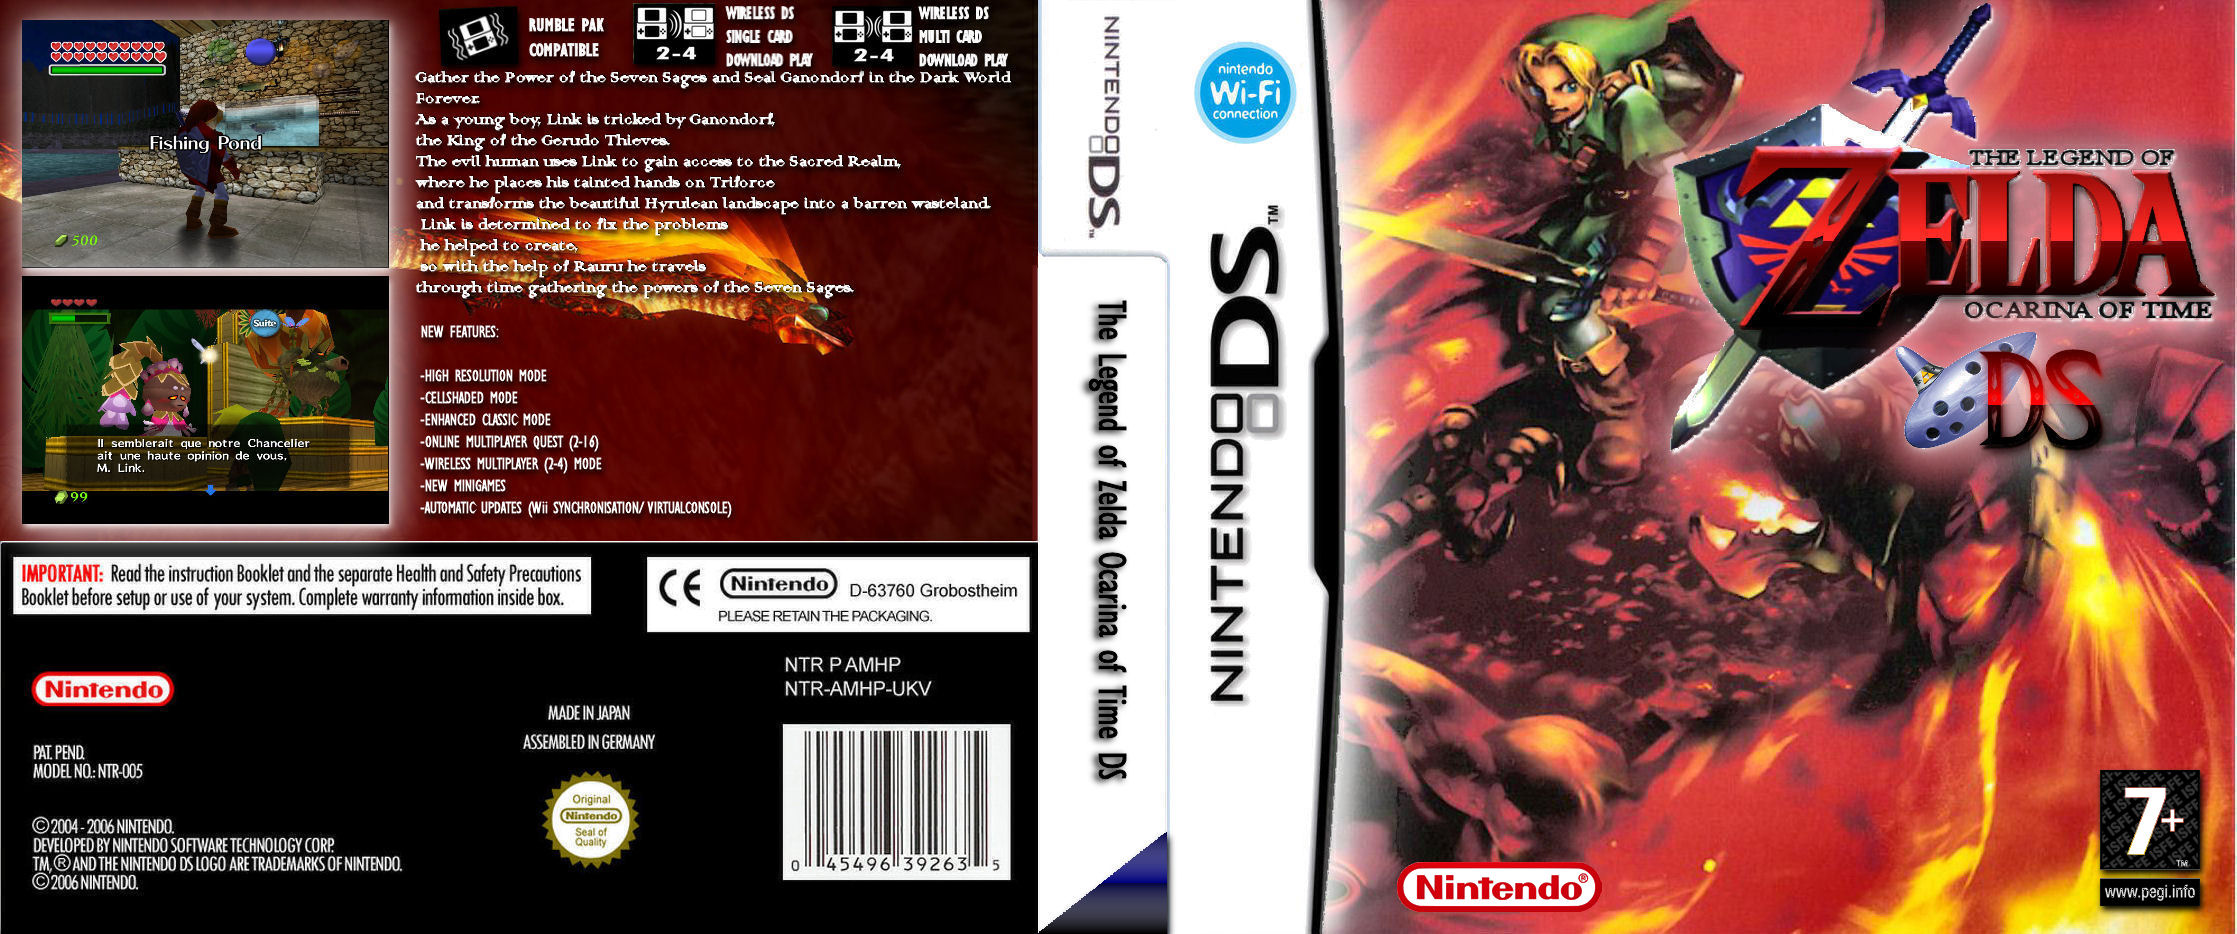 The Legend of Zelda: Ocarina of Time DS Nintendo DS Box Art